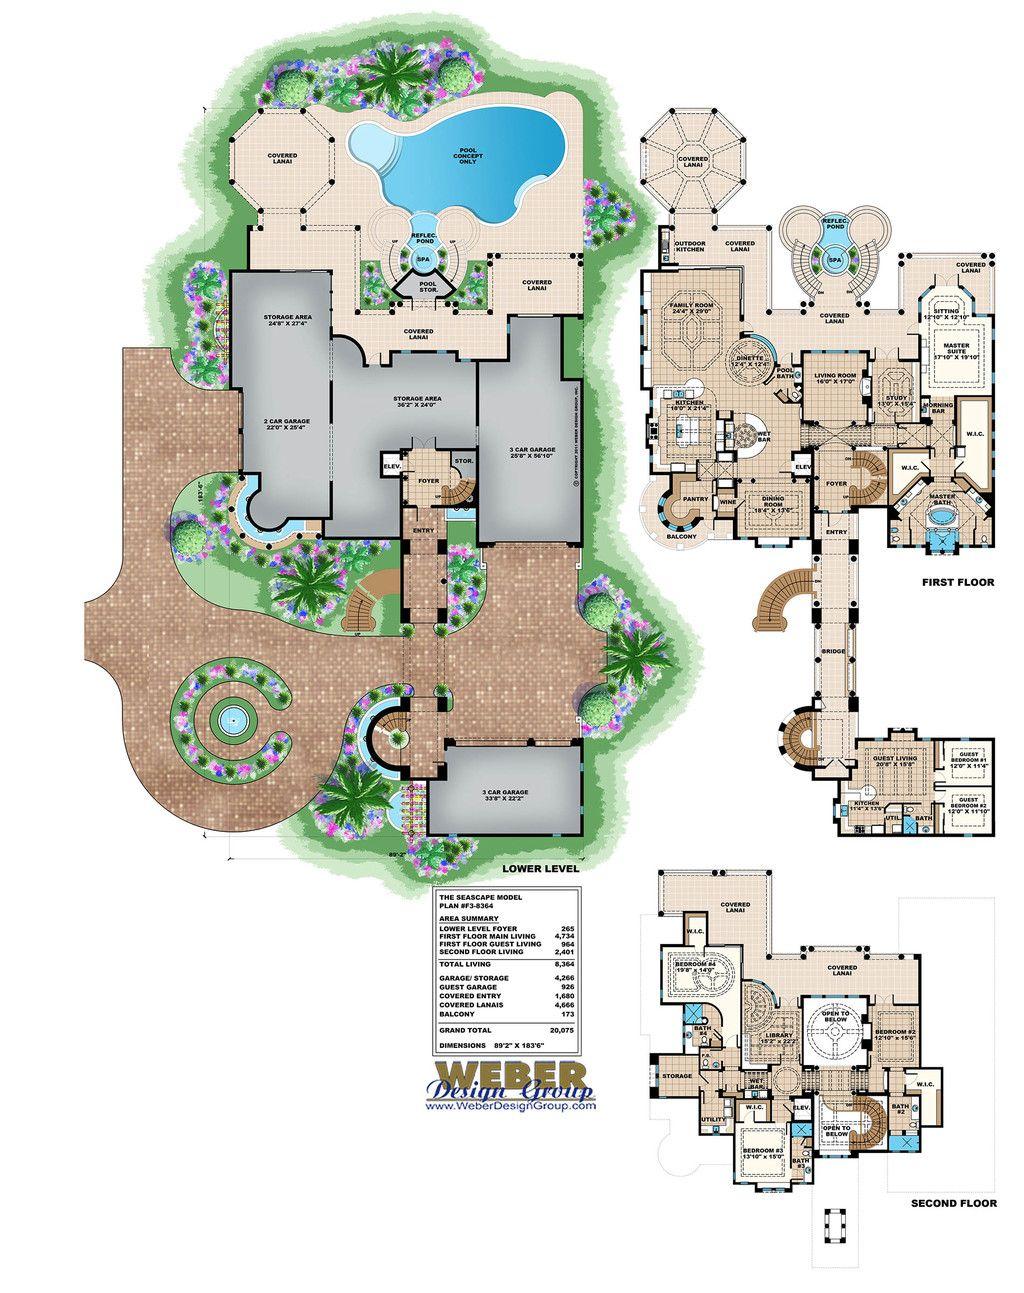 W1024 Jpg 1024 1293 Mansion Floor Plan House Plans Mansion House Floor Plans